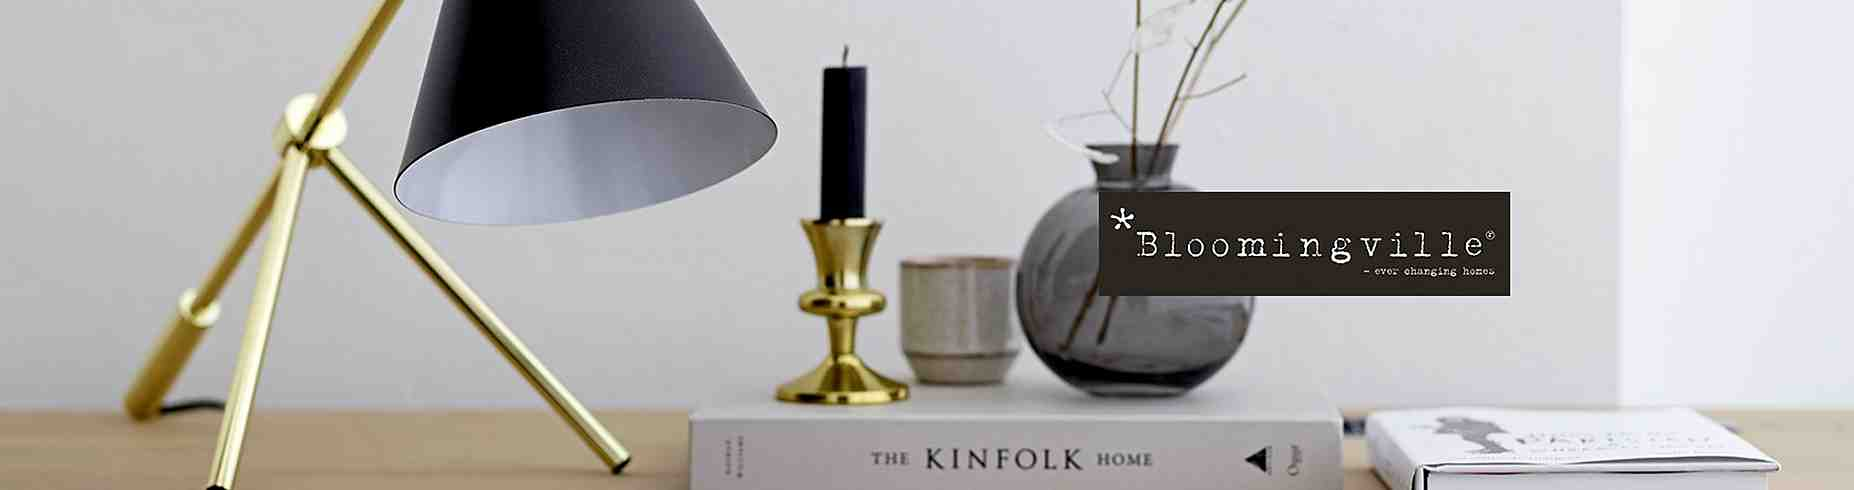 bloomingville dekoration online kaufen otto. Black Bedroom Furniture Sets. Home Design Ideas